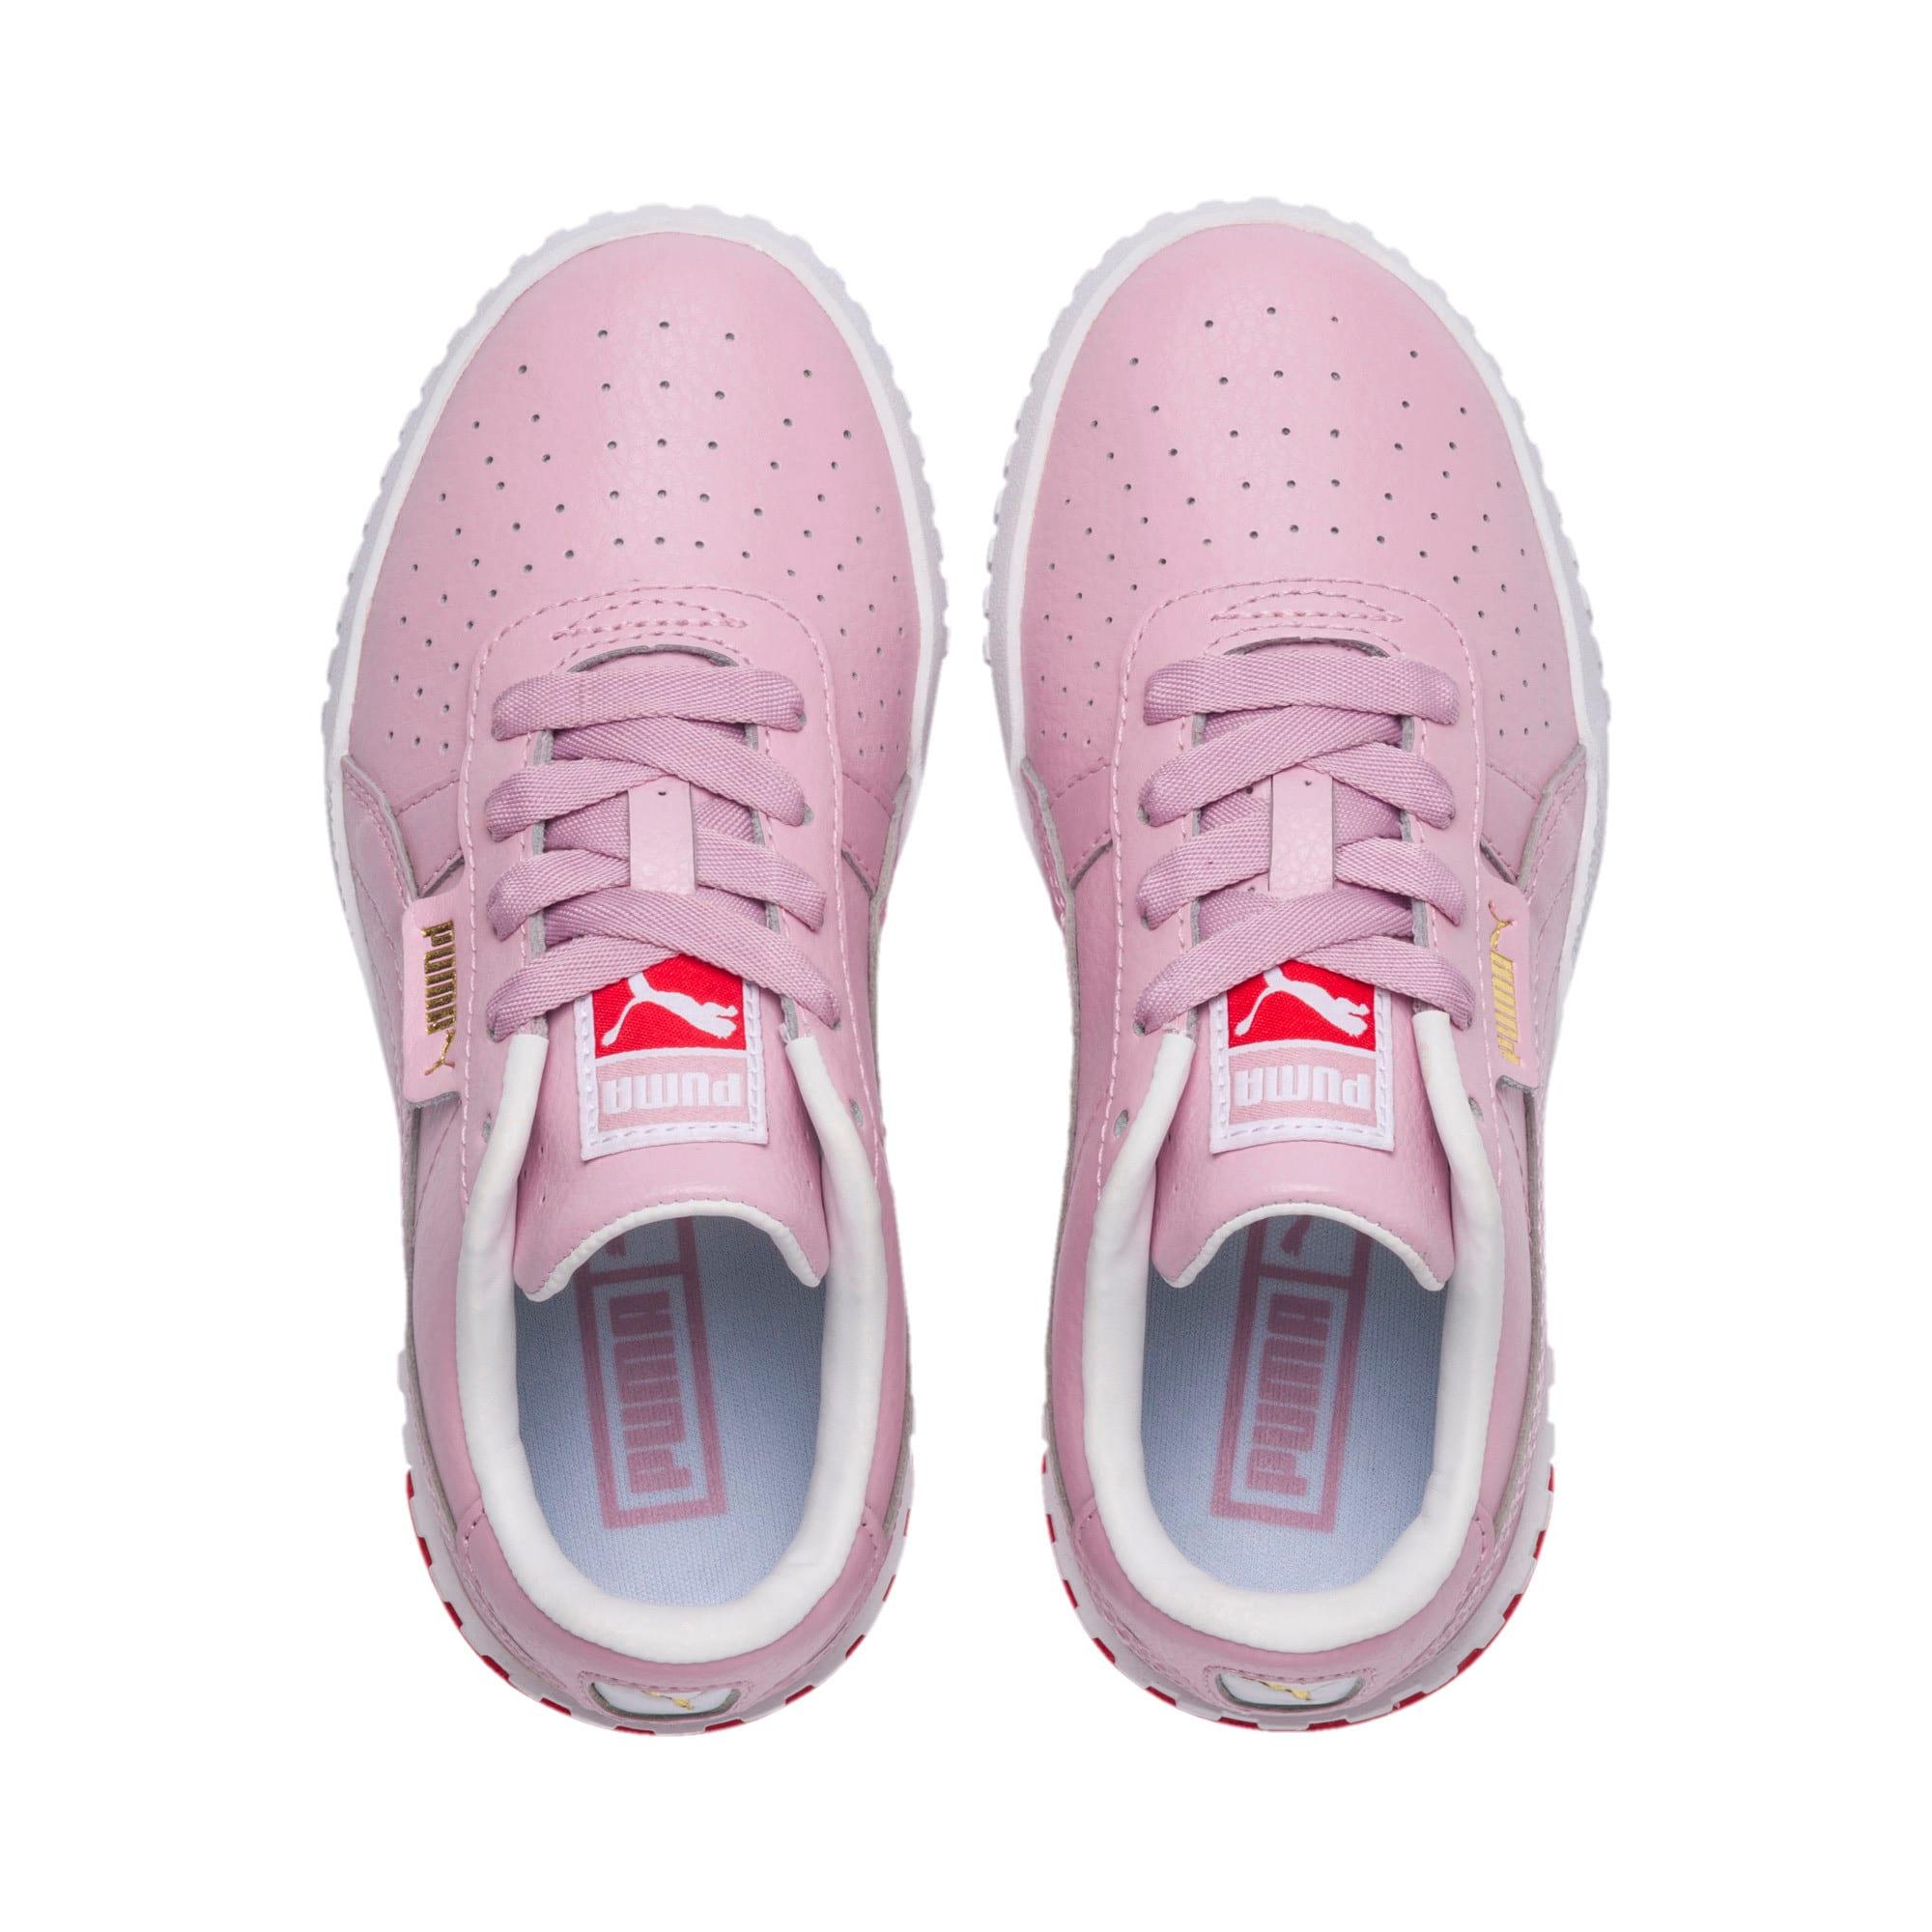 Thumbnail 6 of Cali Little Kids' Shoes, Puma White-Hibiscus, medium